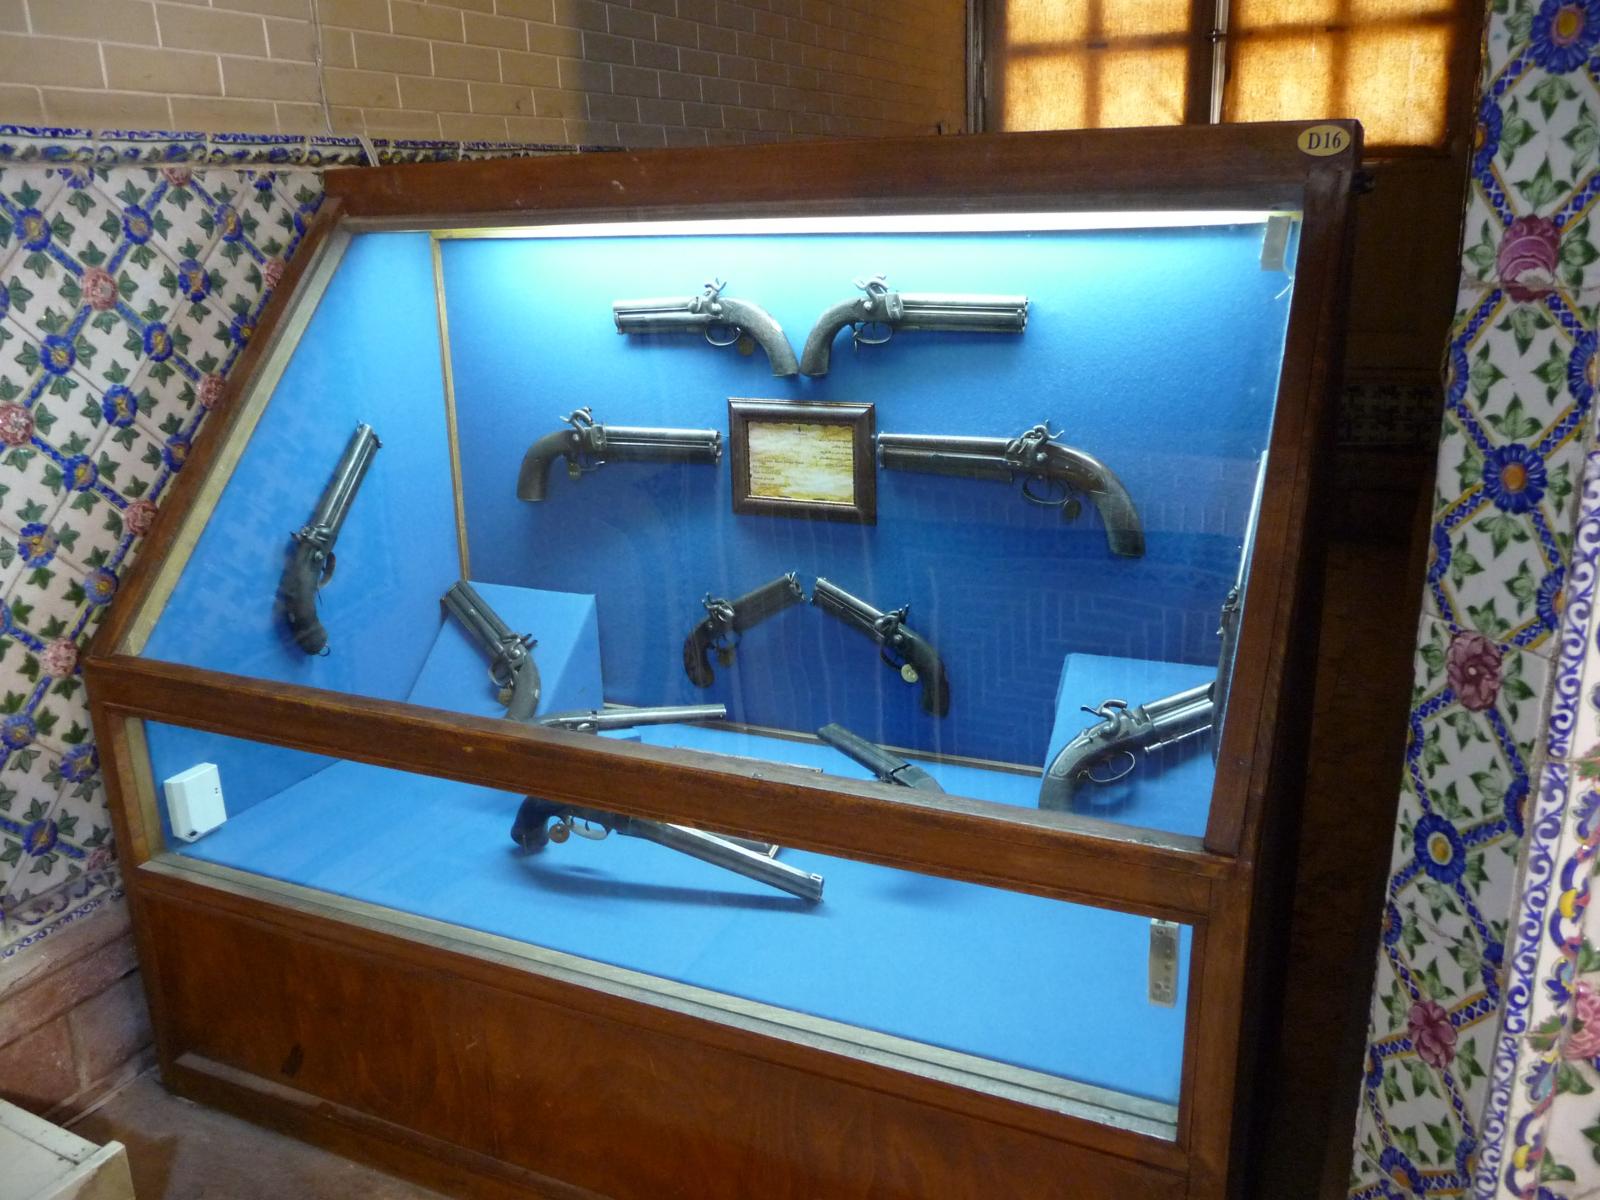 Baq-e Afifabad - Museum - Pistols - Qajar Period 19C England